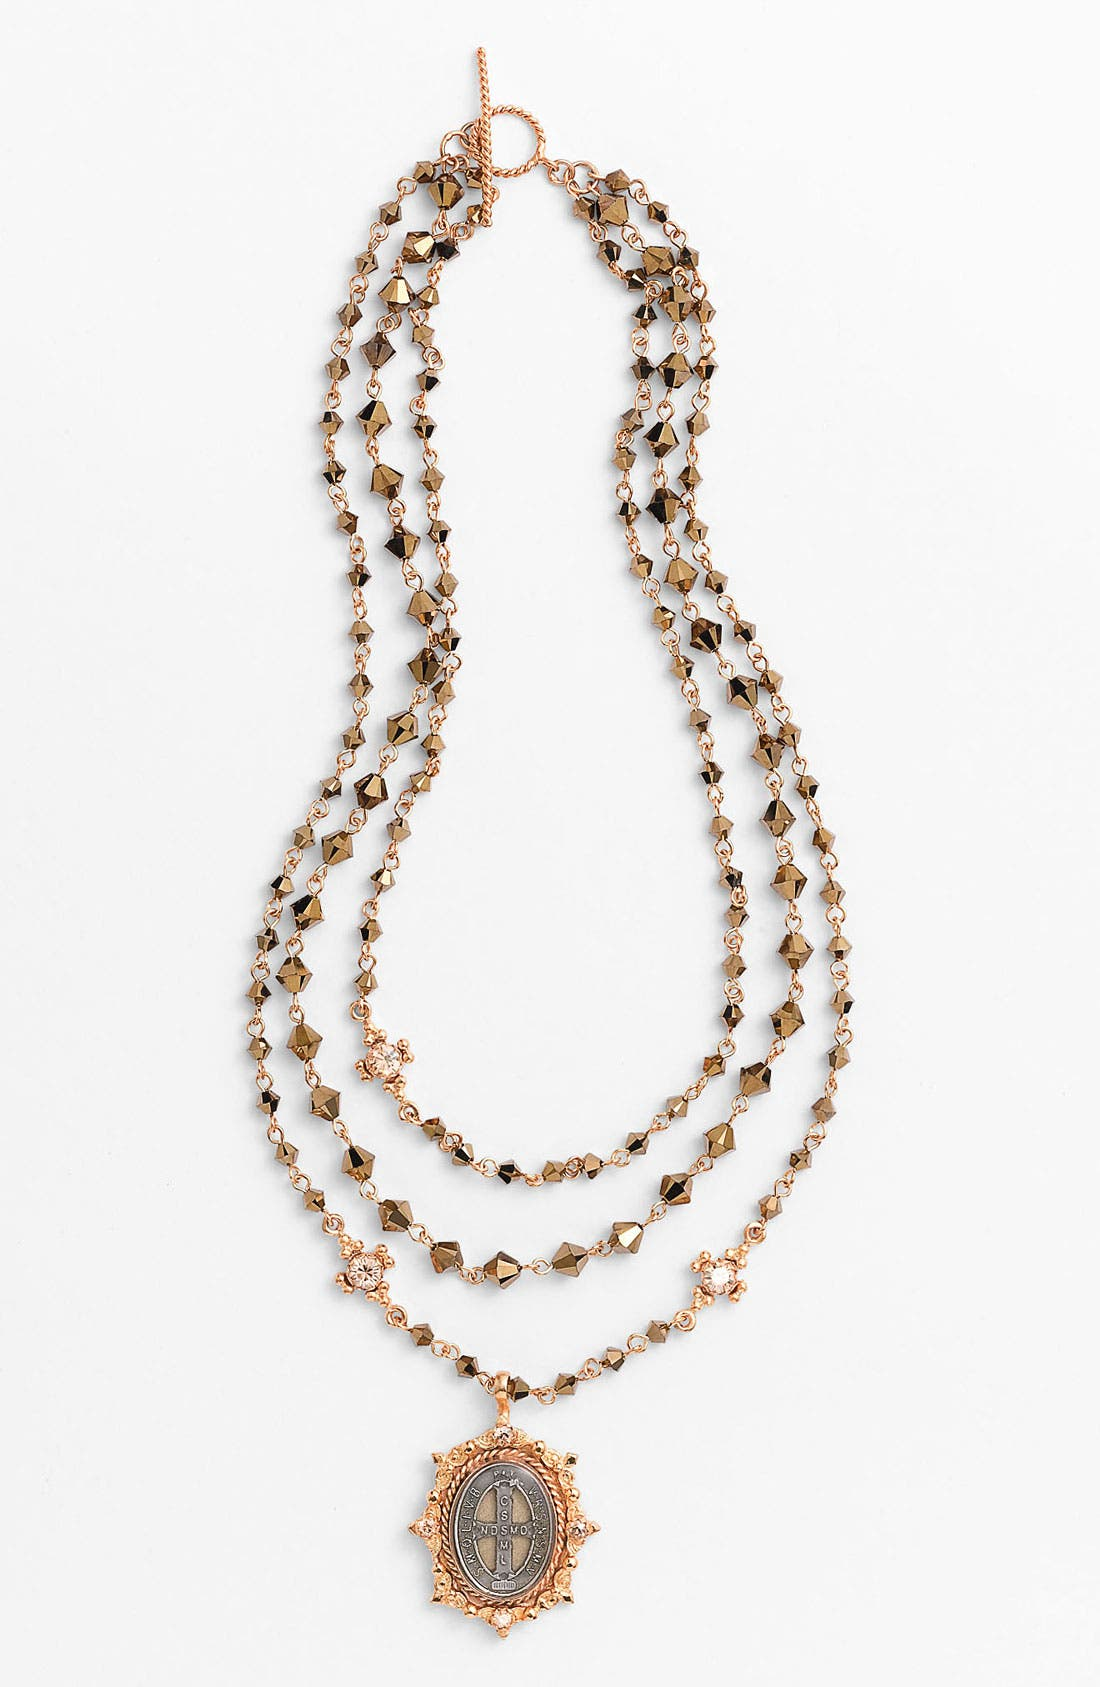 Main Image - Virgins Saints & Angels 'Oval Magdalena' Necklace (Nordstrom Exclusive)